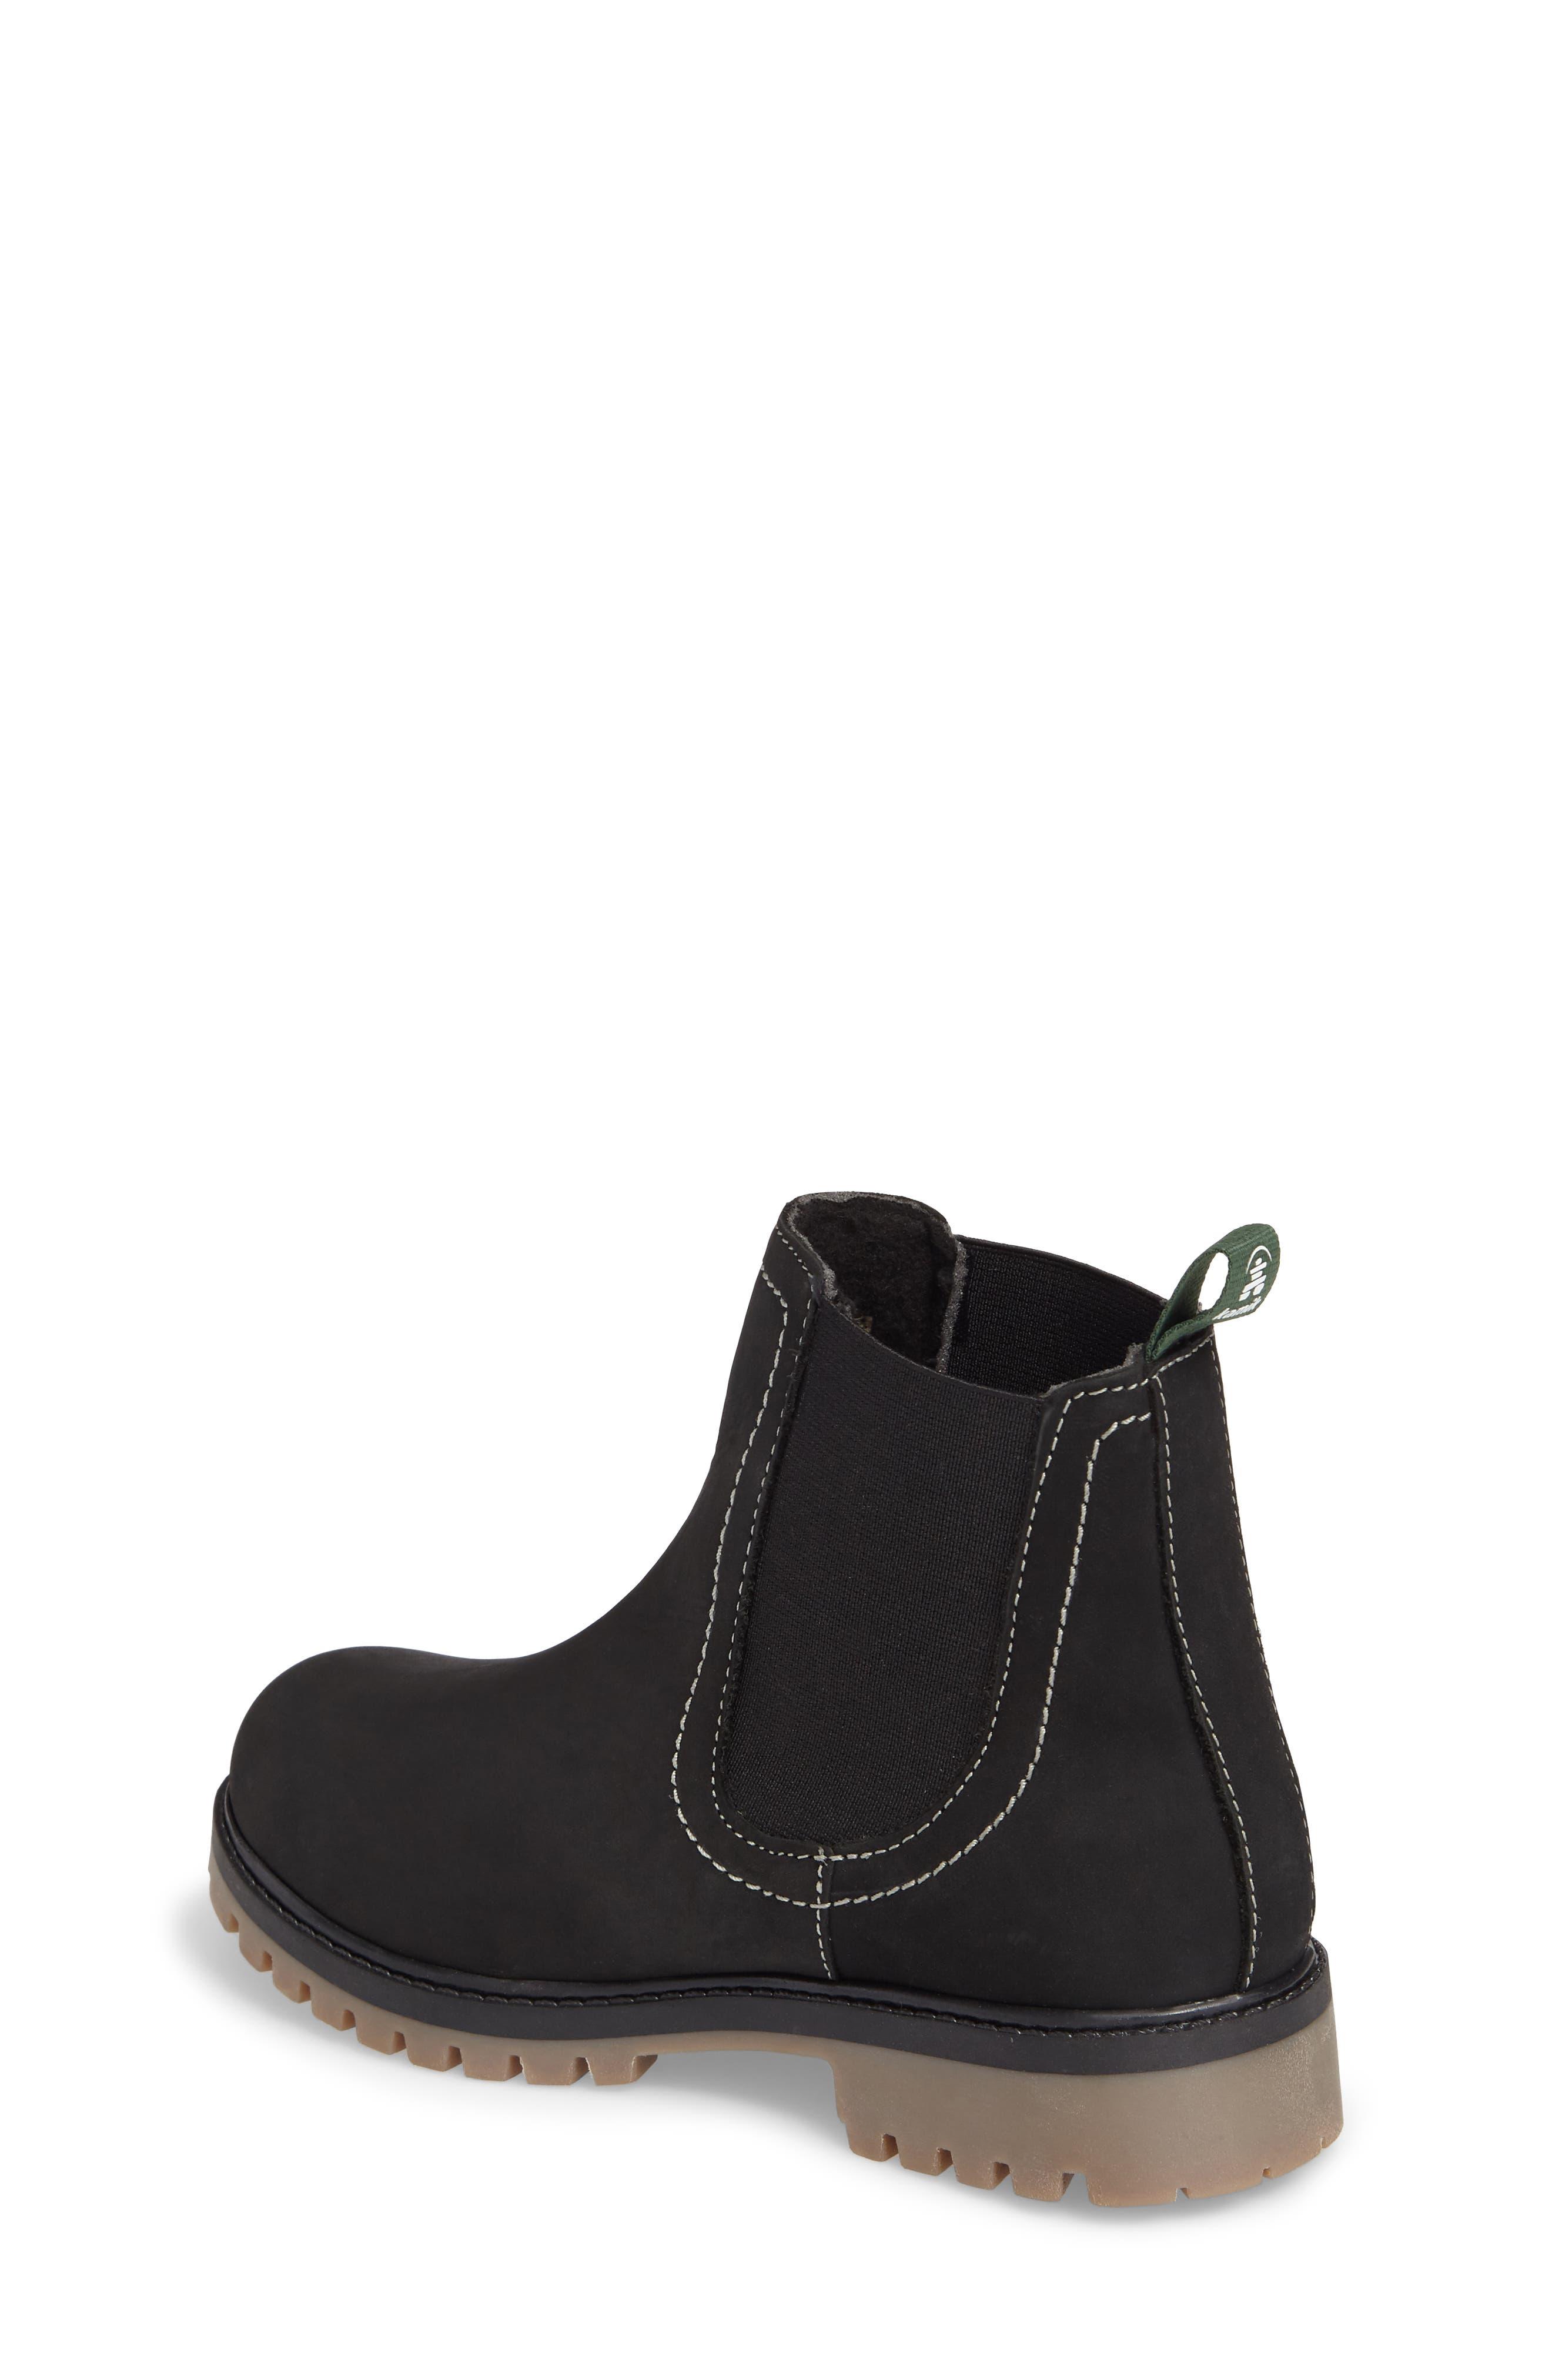 TakodaC Waterproof Chelsea Boot,                             Alternate thumbnail 2, color,                             010